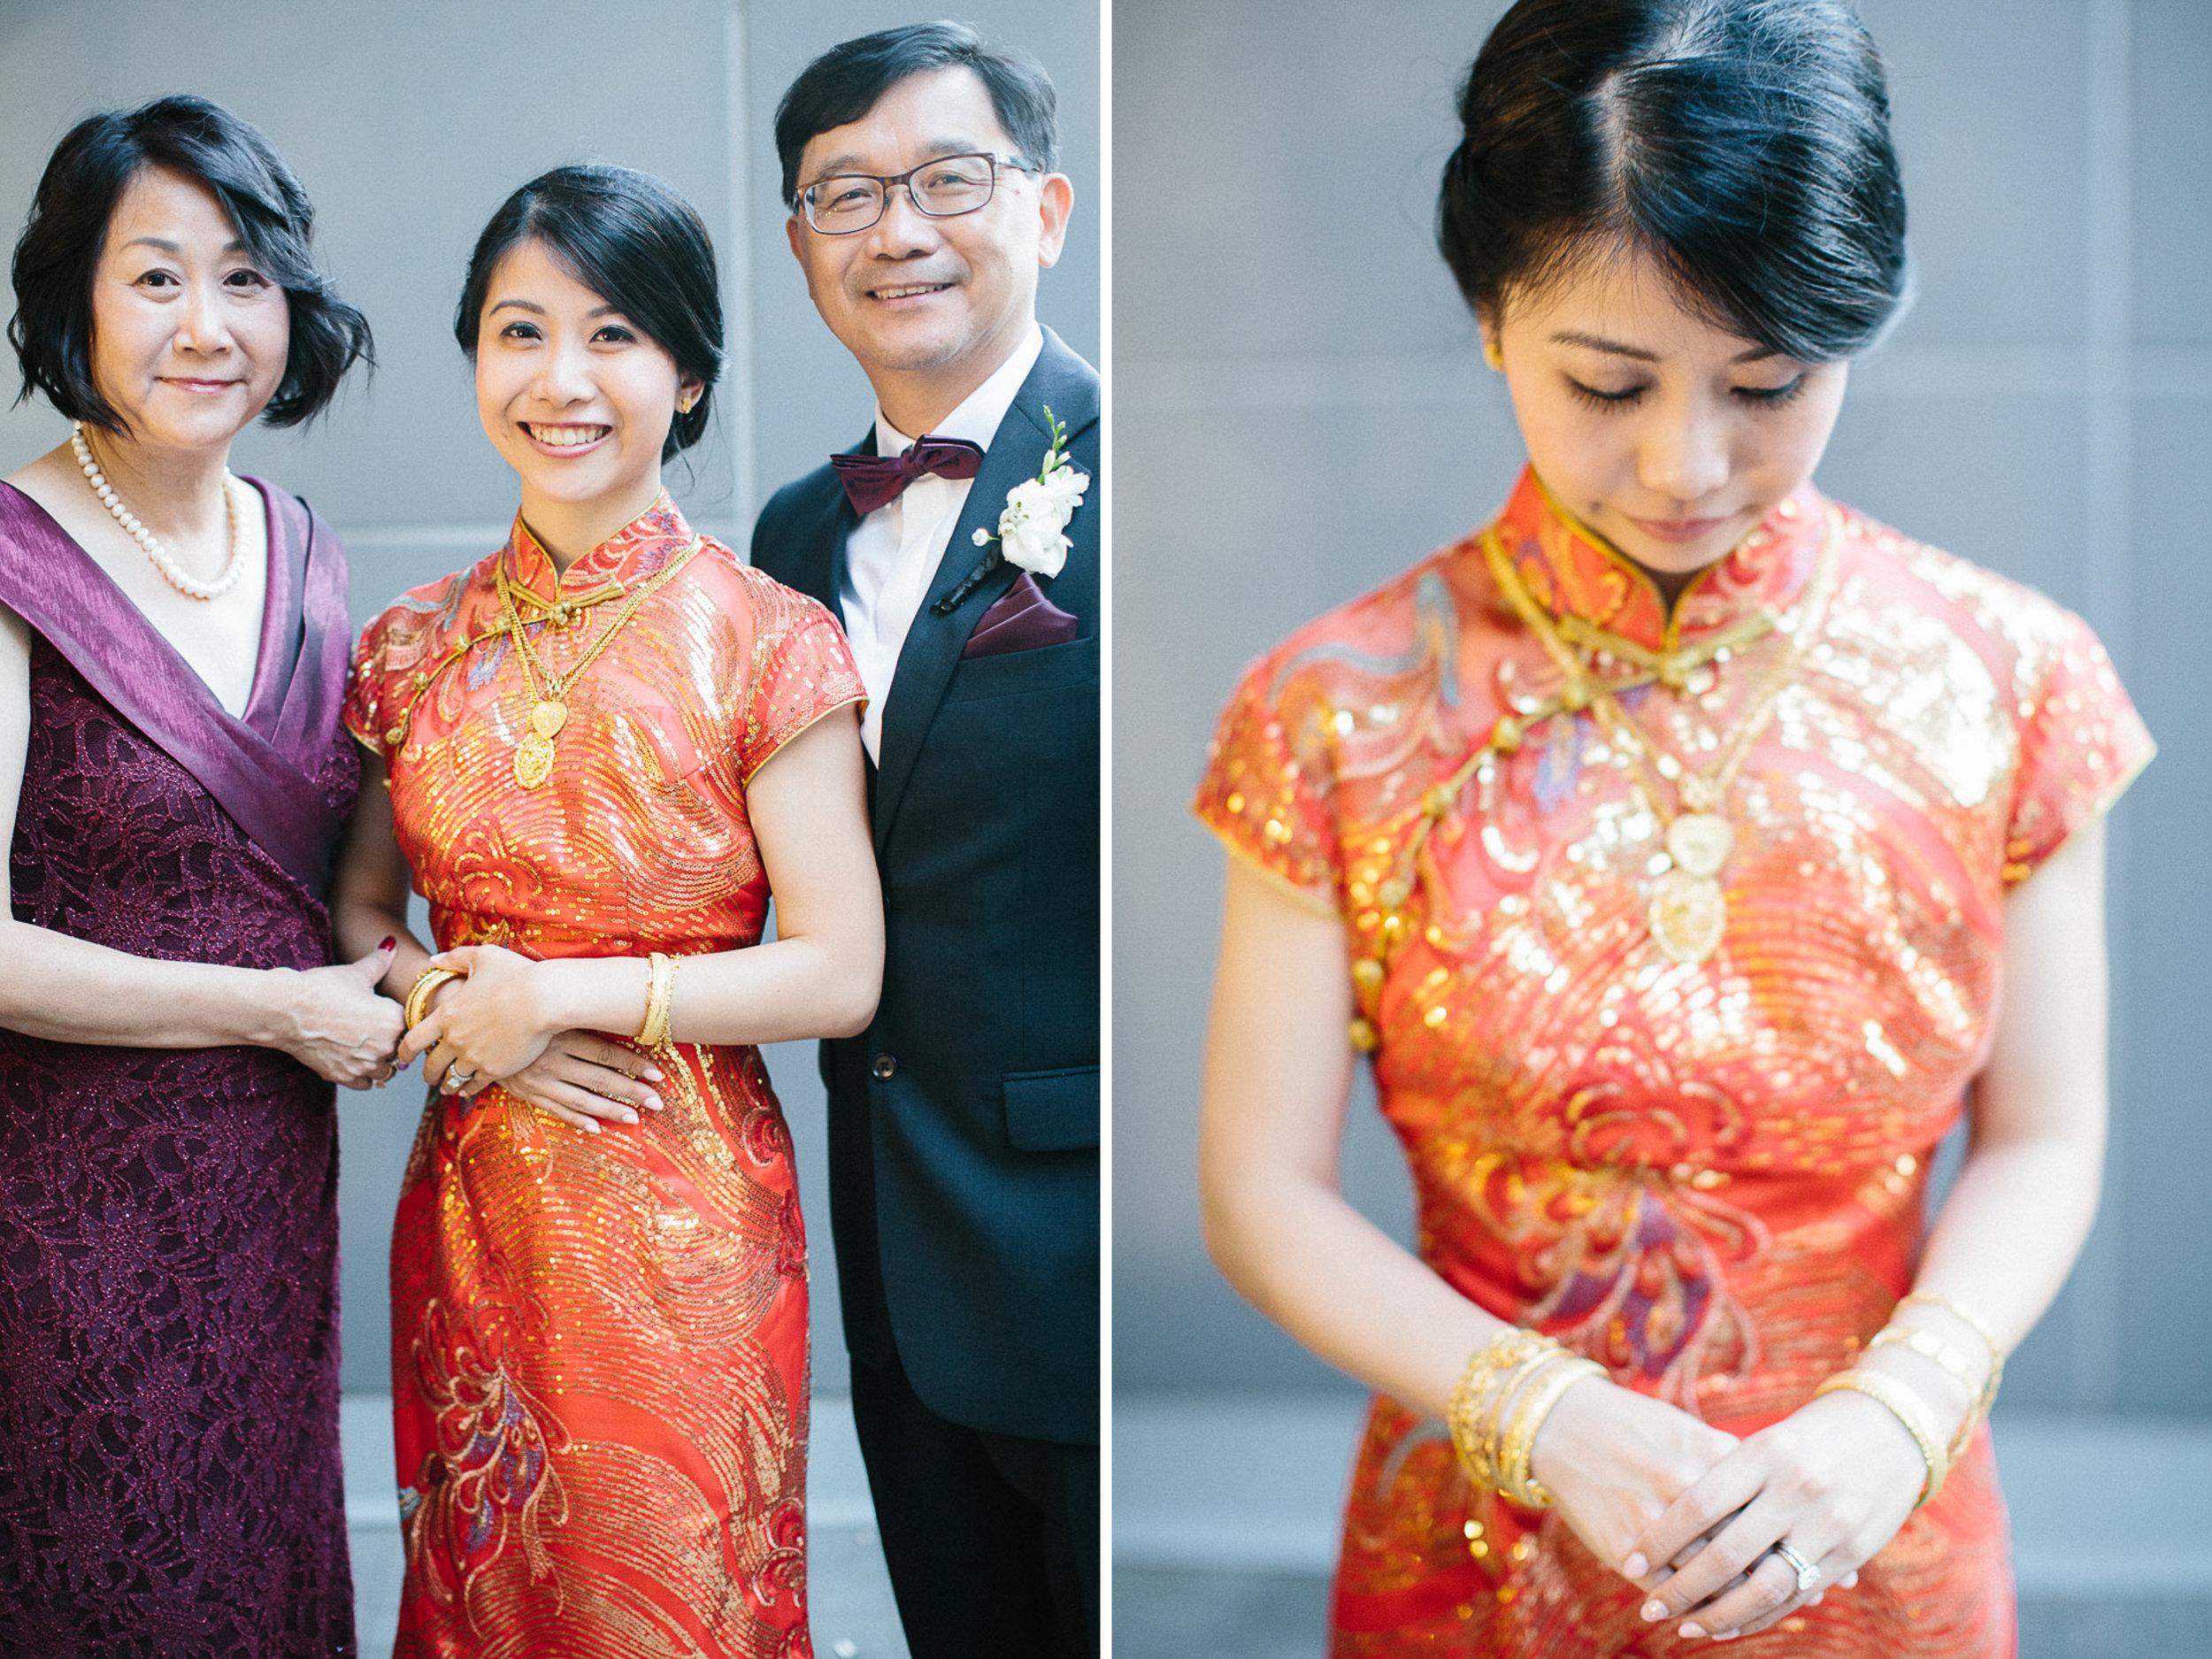 toronto_wedding_photographer_reference_library17.jpg